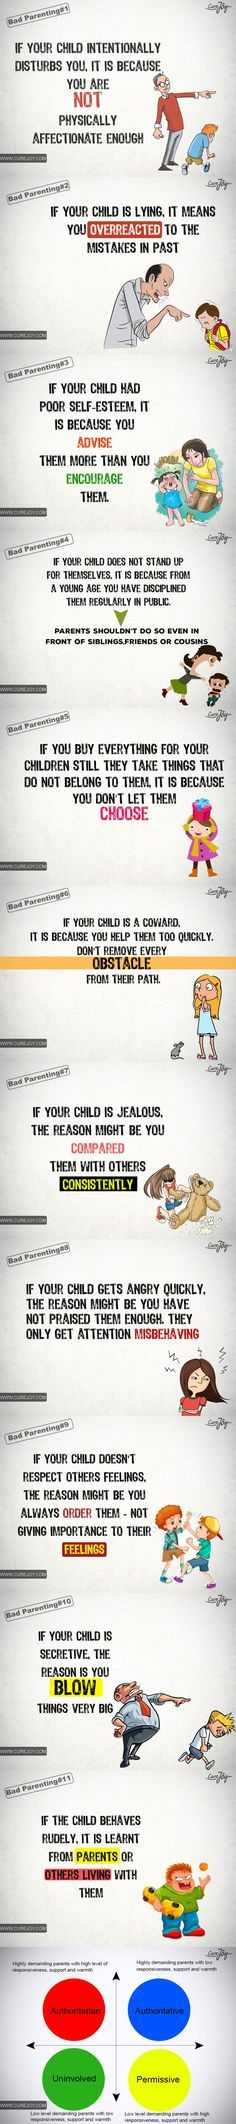 Found parents some advice, trust me I'm a psychologist - 9GAG